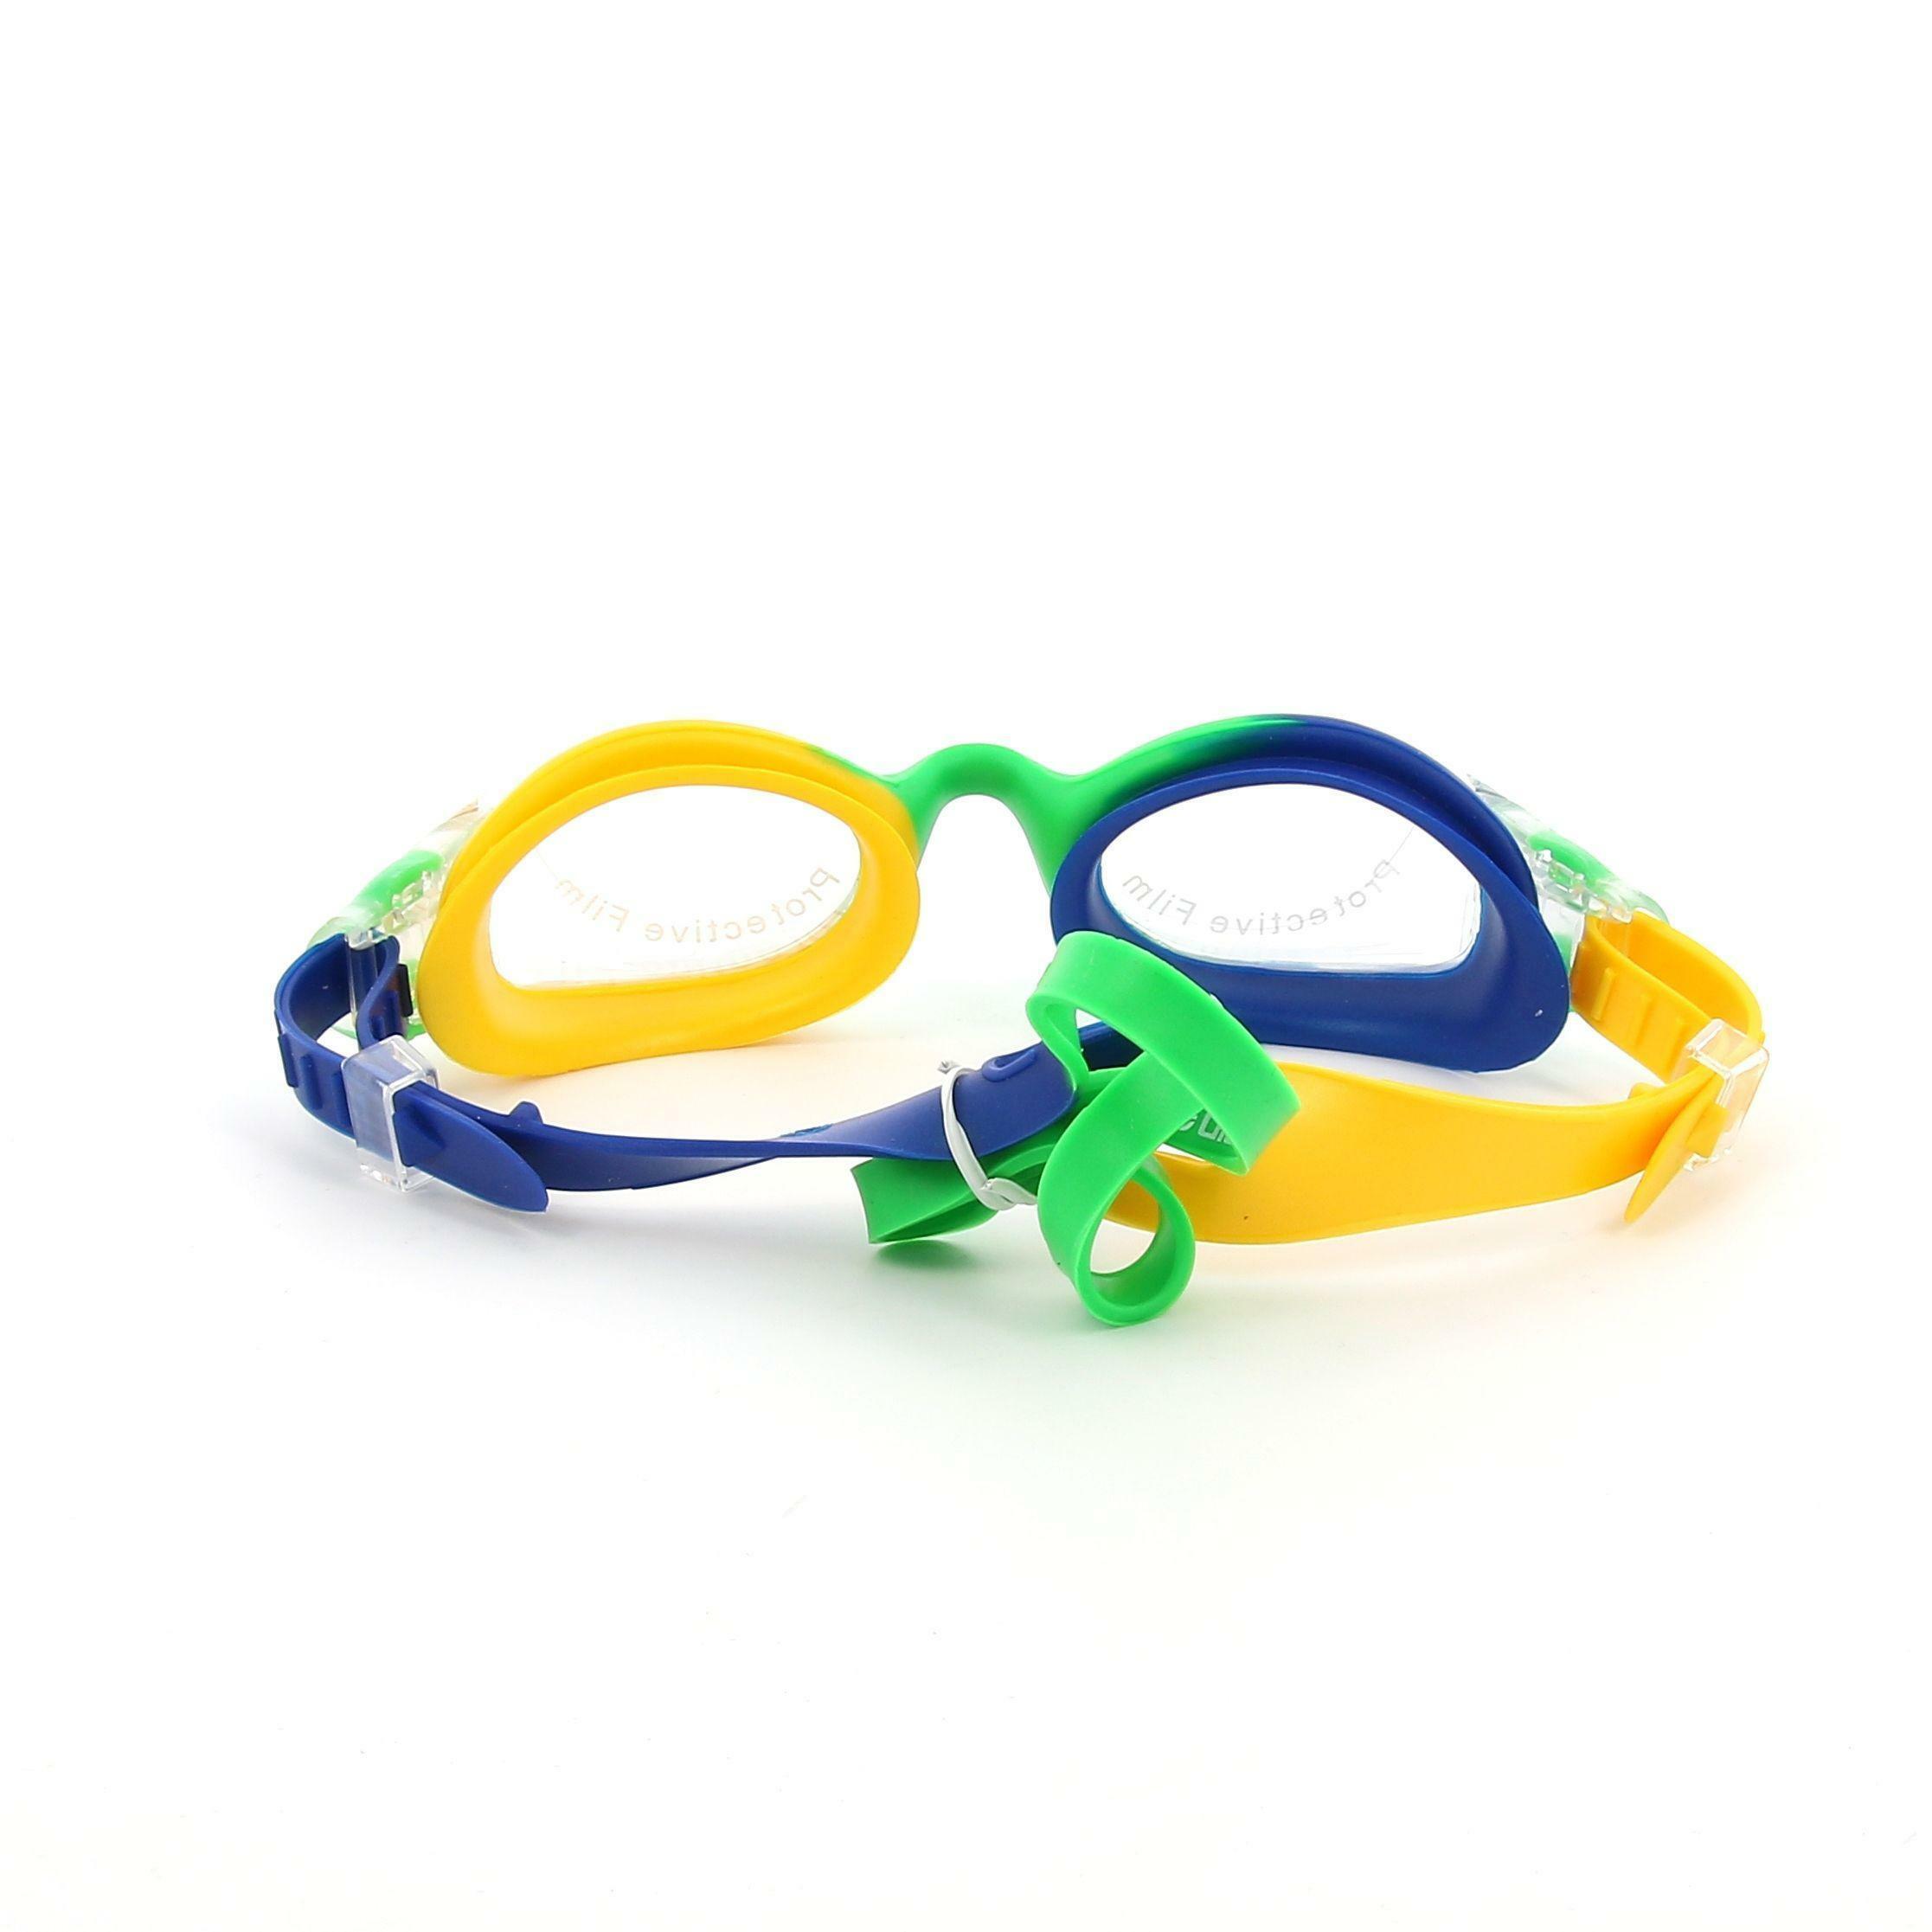 aquarapid aquarapid occhialino swimmer unisex bambino giallo verde